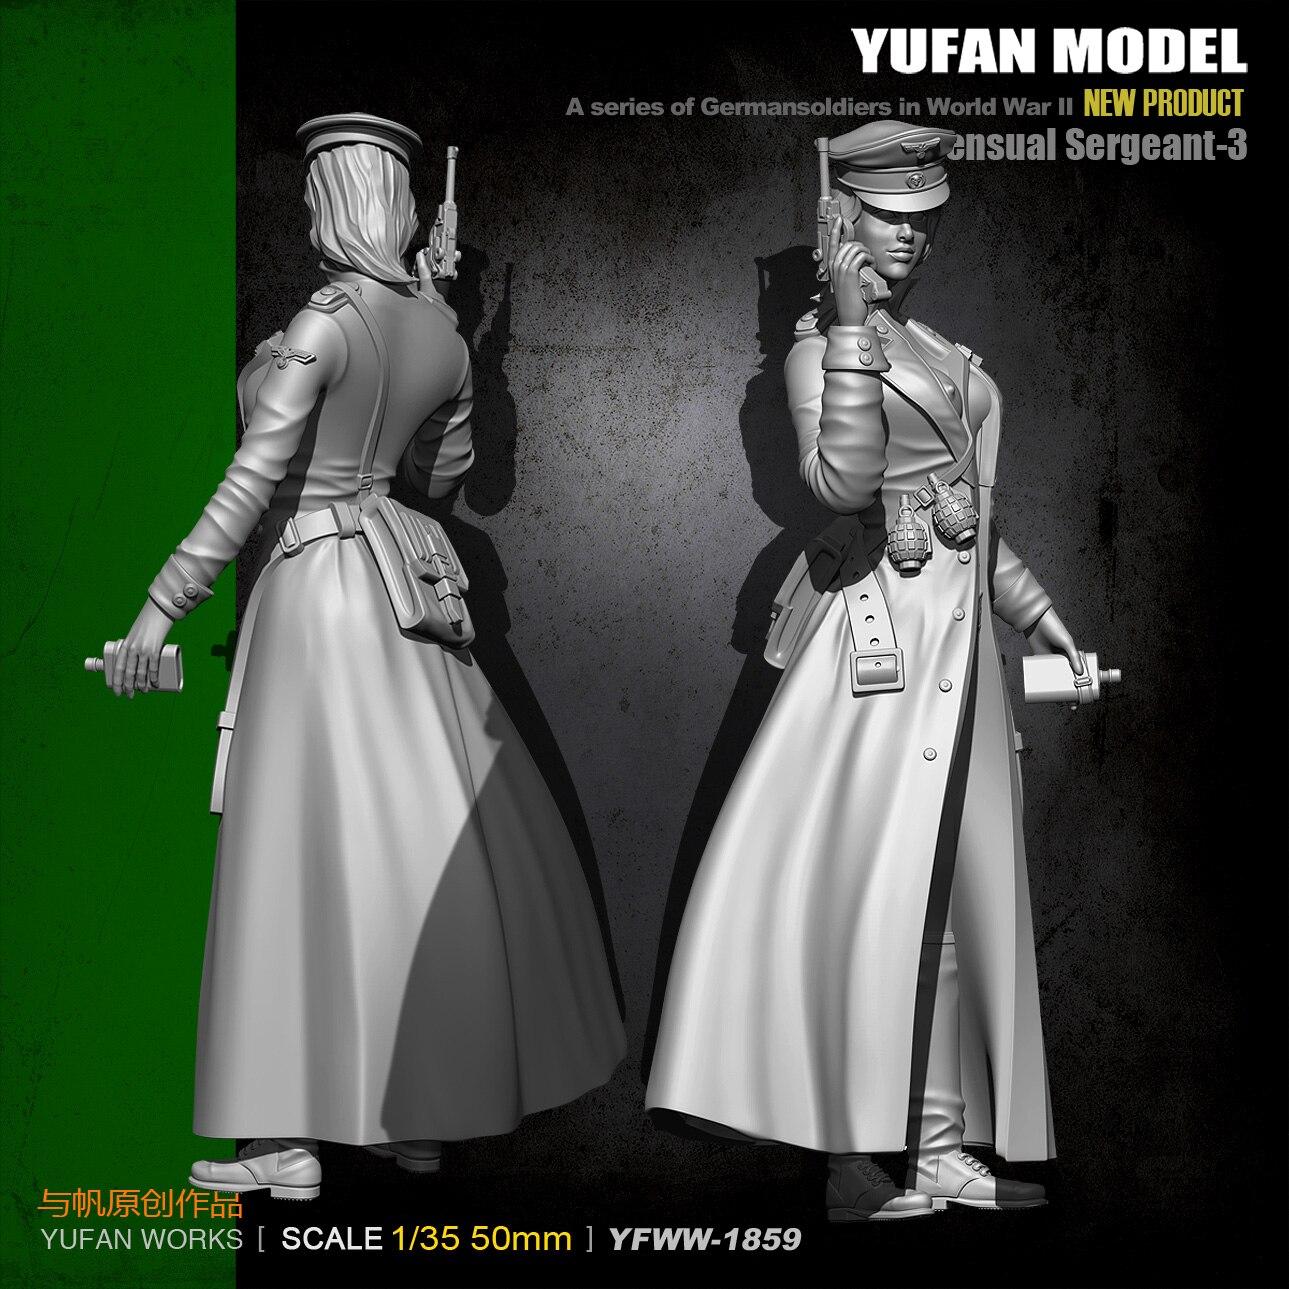 1/35 Kits de Resina Figura Yufan Modelo Soldado Resina Mulheres Oficiais Modelo Soldado Kit Yfww35-1859 Bulding